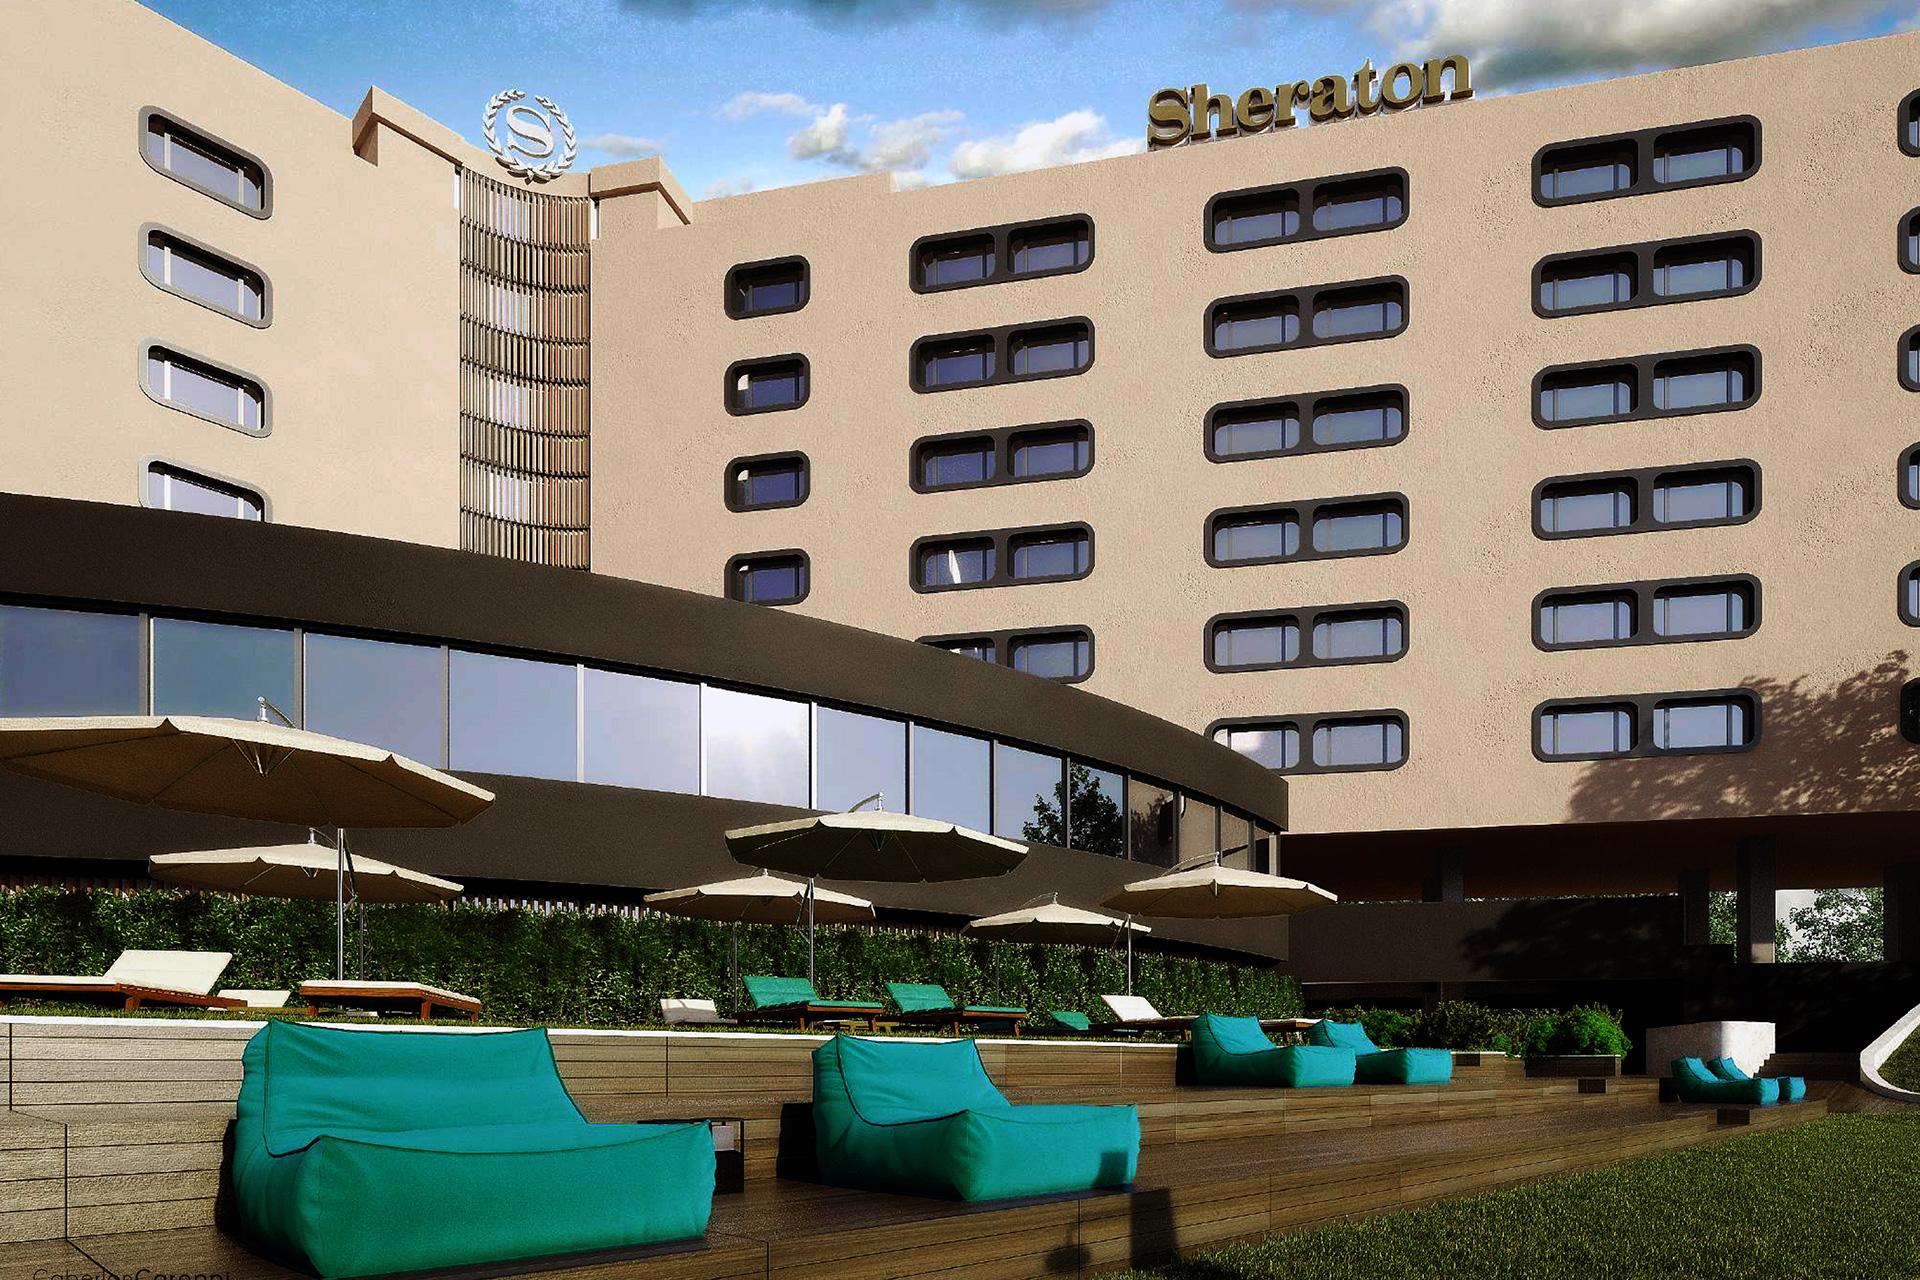 HOTEL SHERATON 24